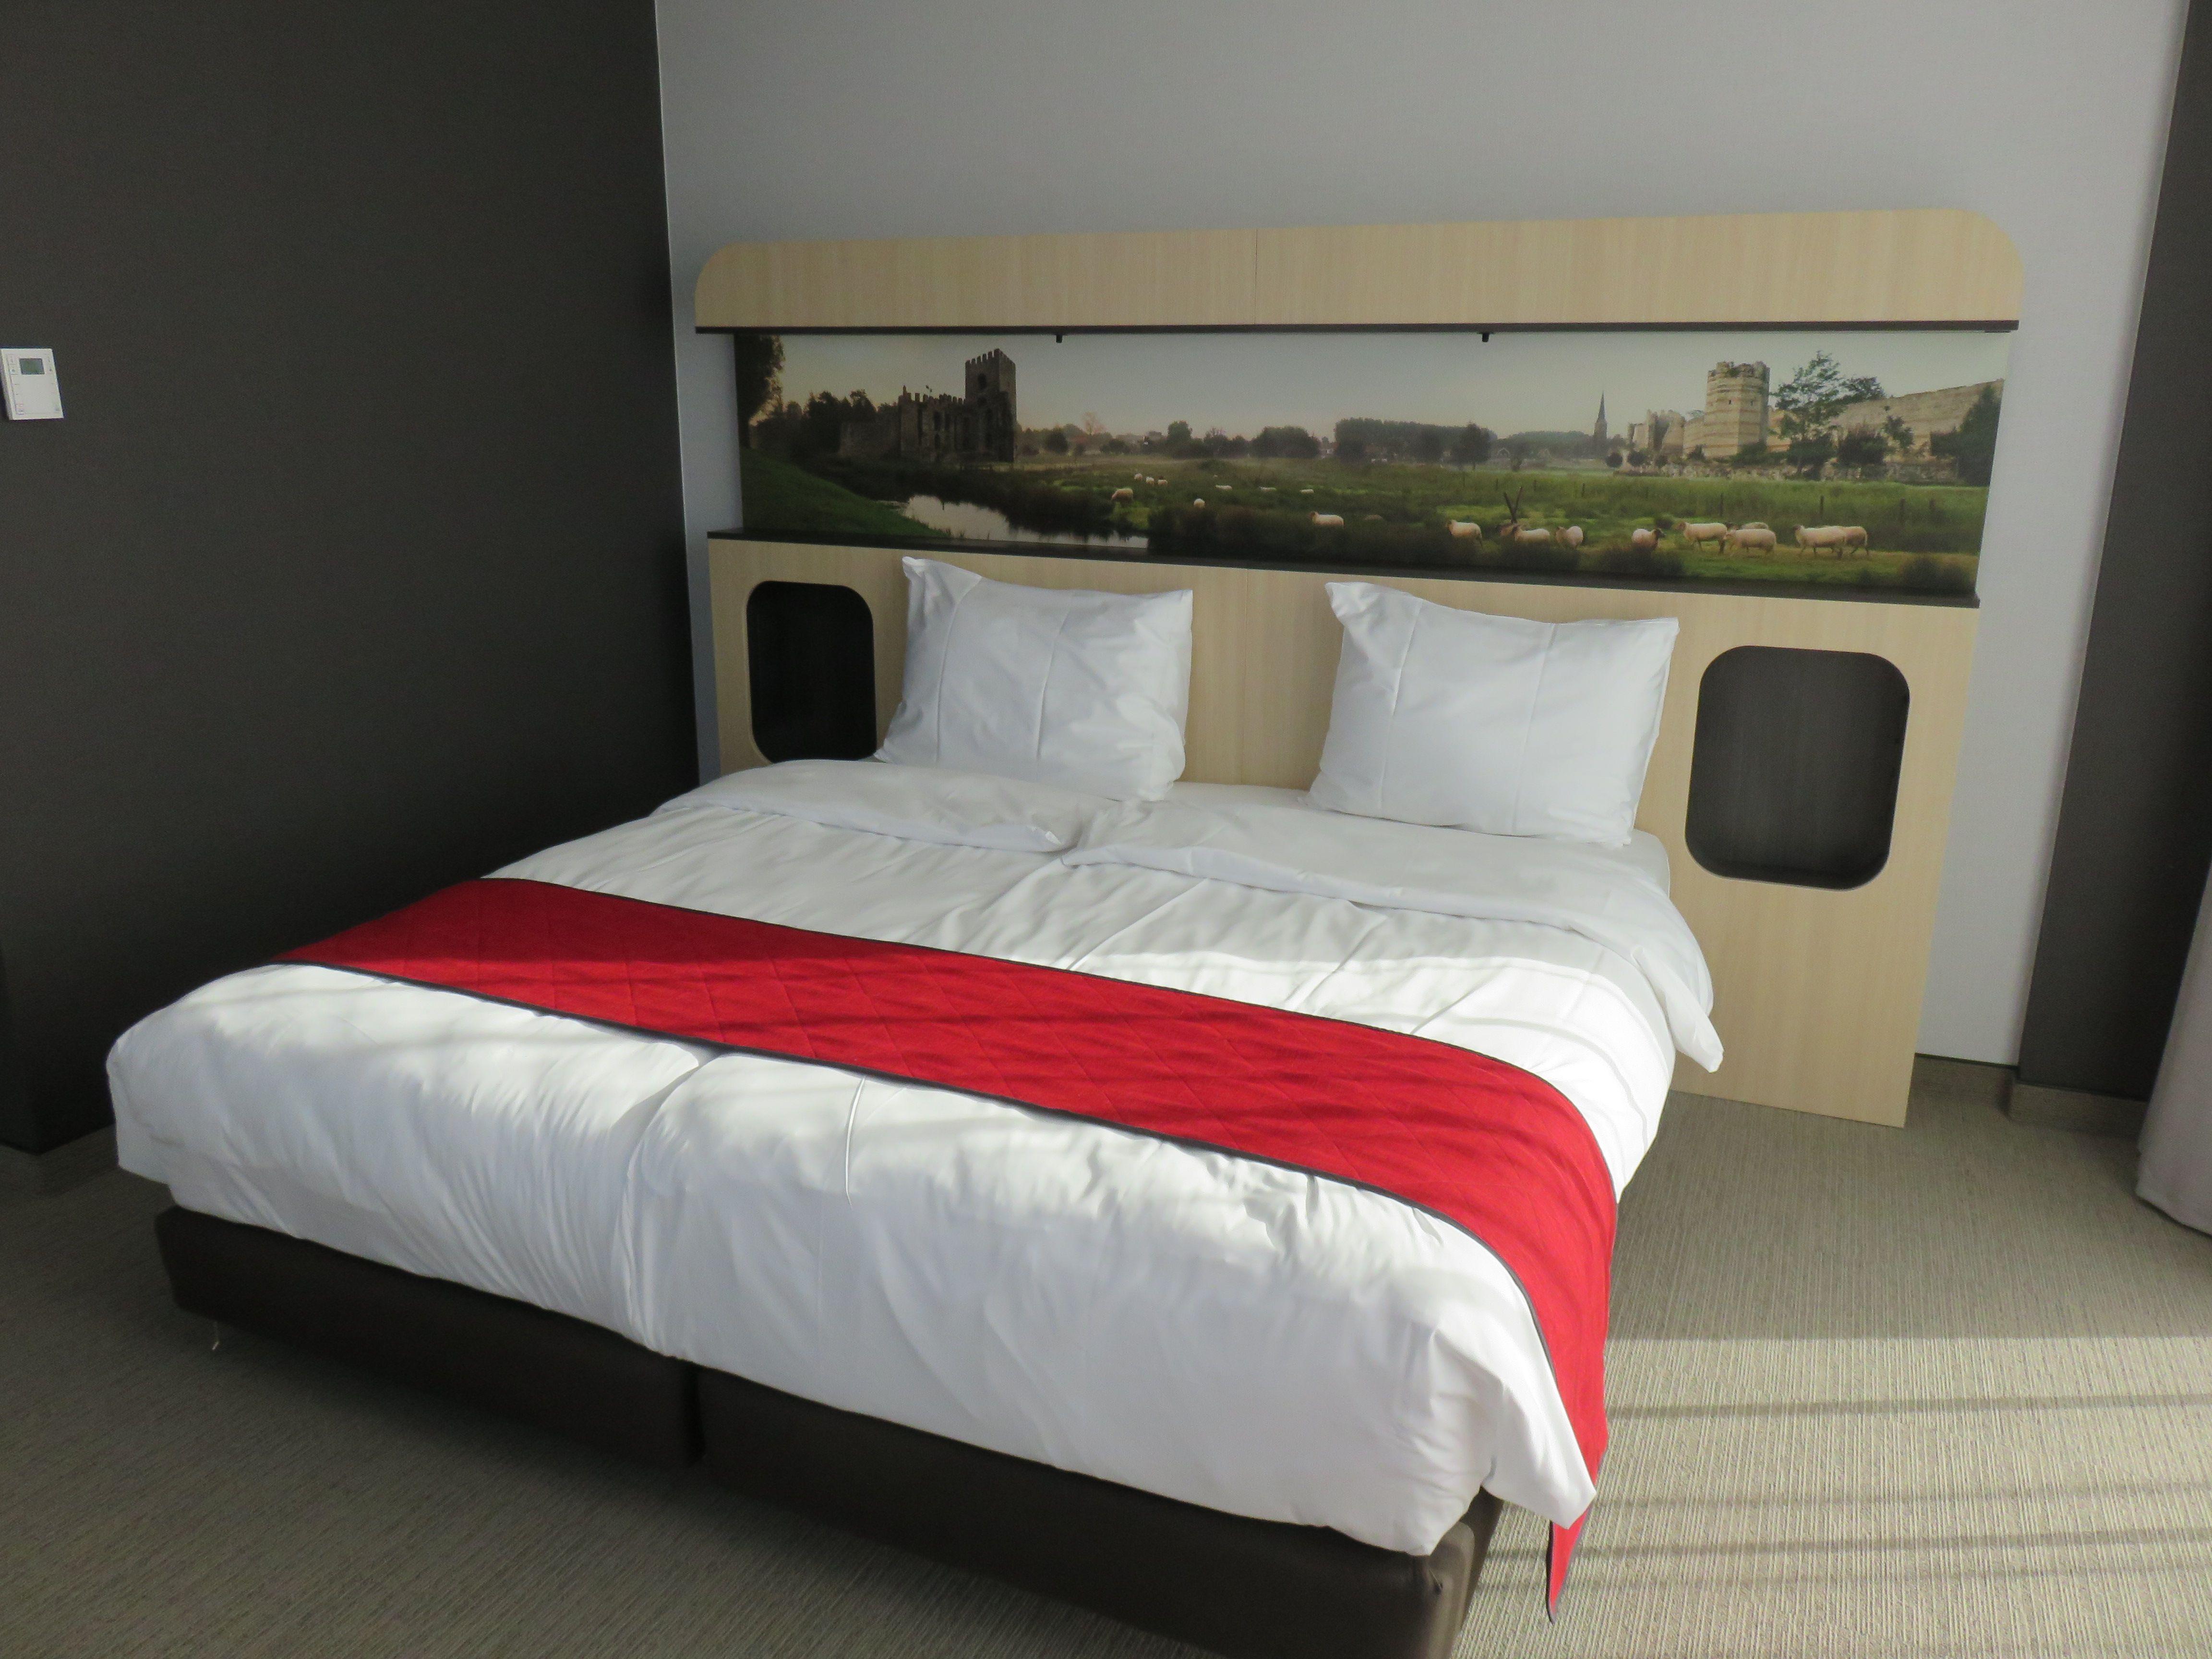 Interior Corendon Vitality Hotel Amsterdam Sleeping Room Hollanda